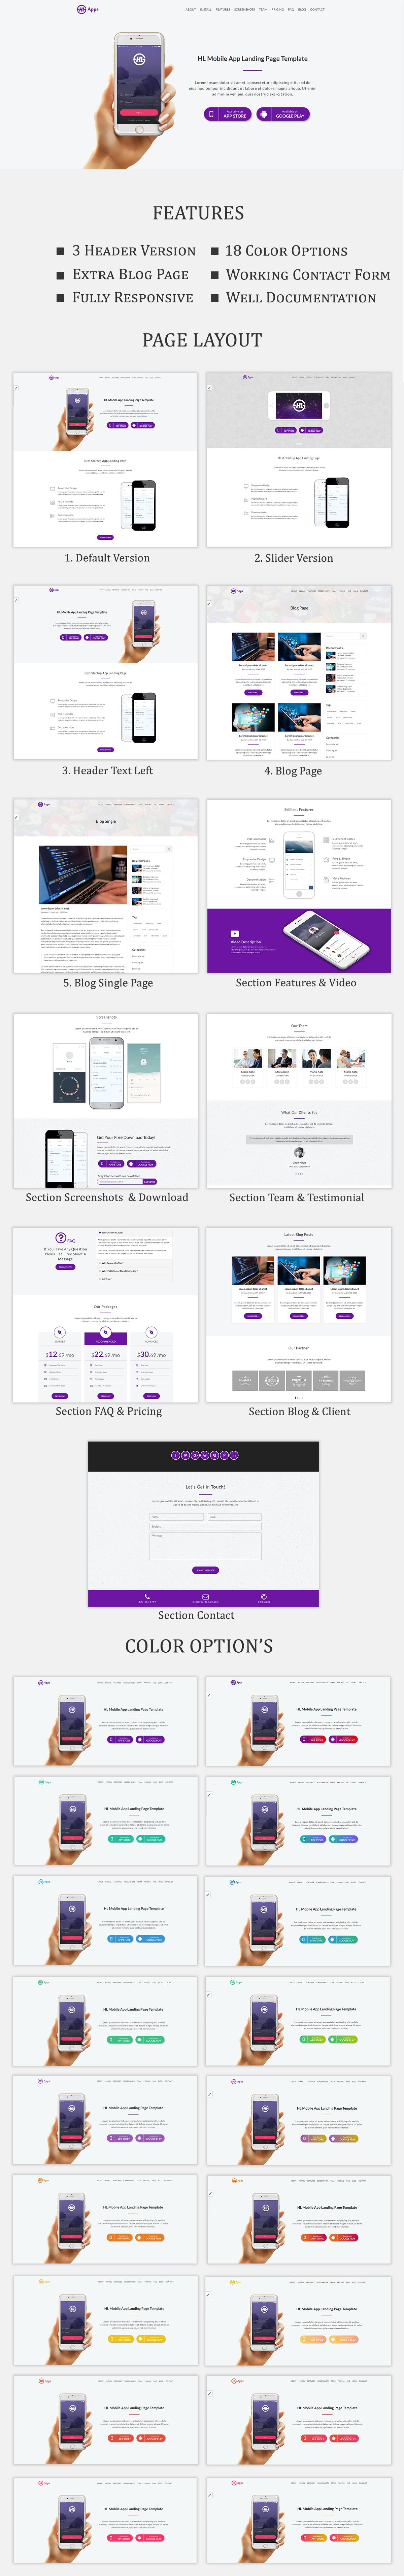 HL - Apps landing page